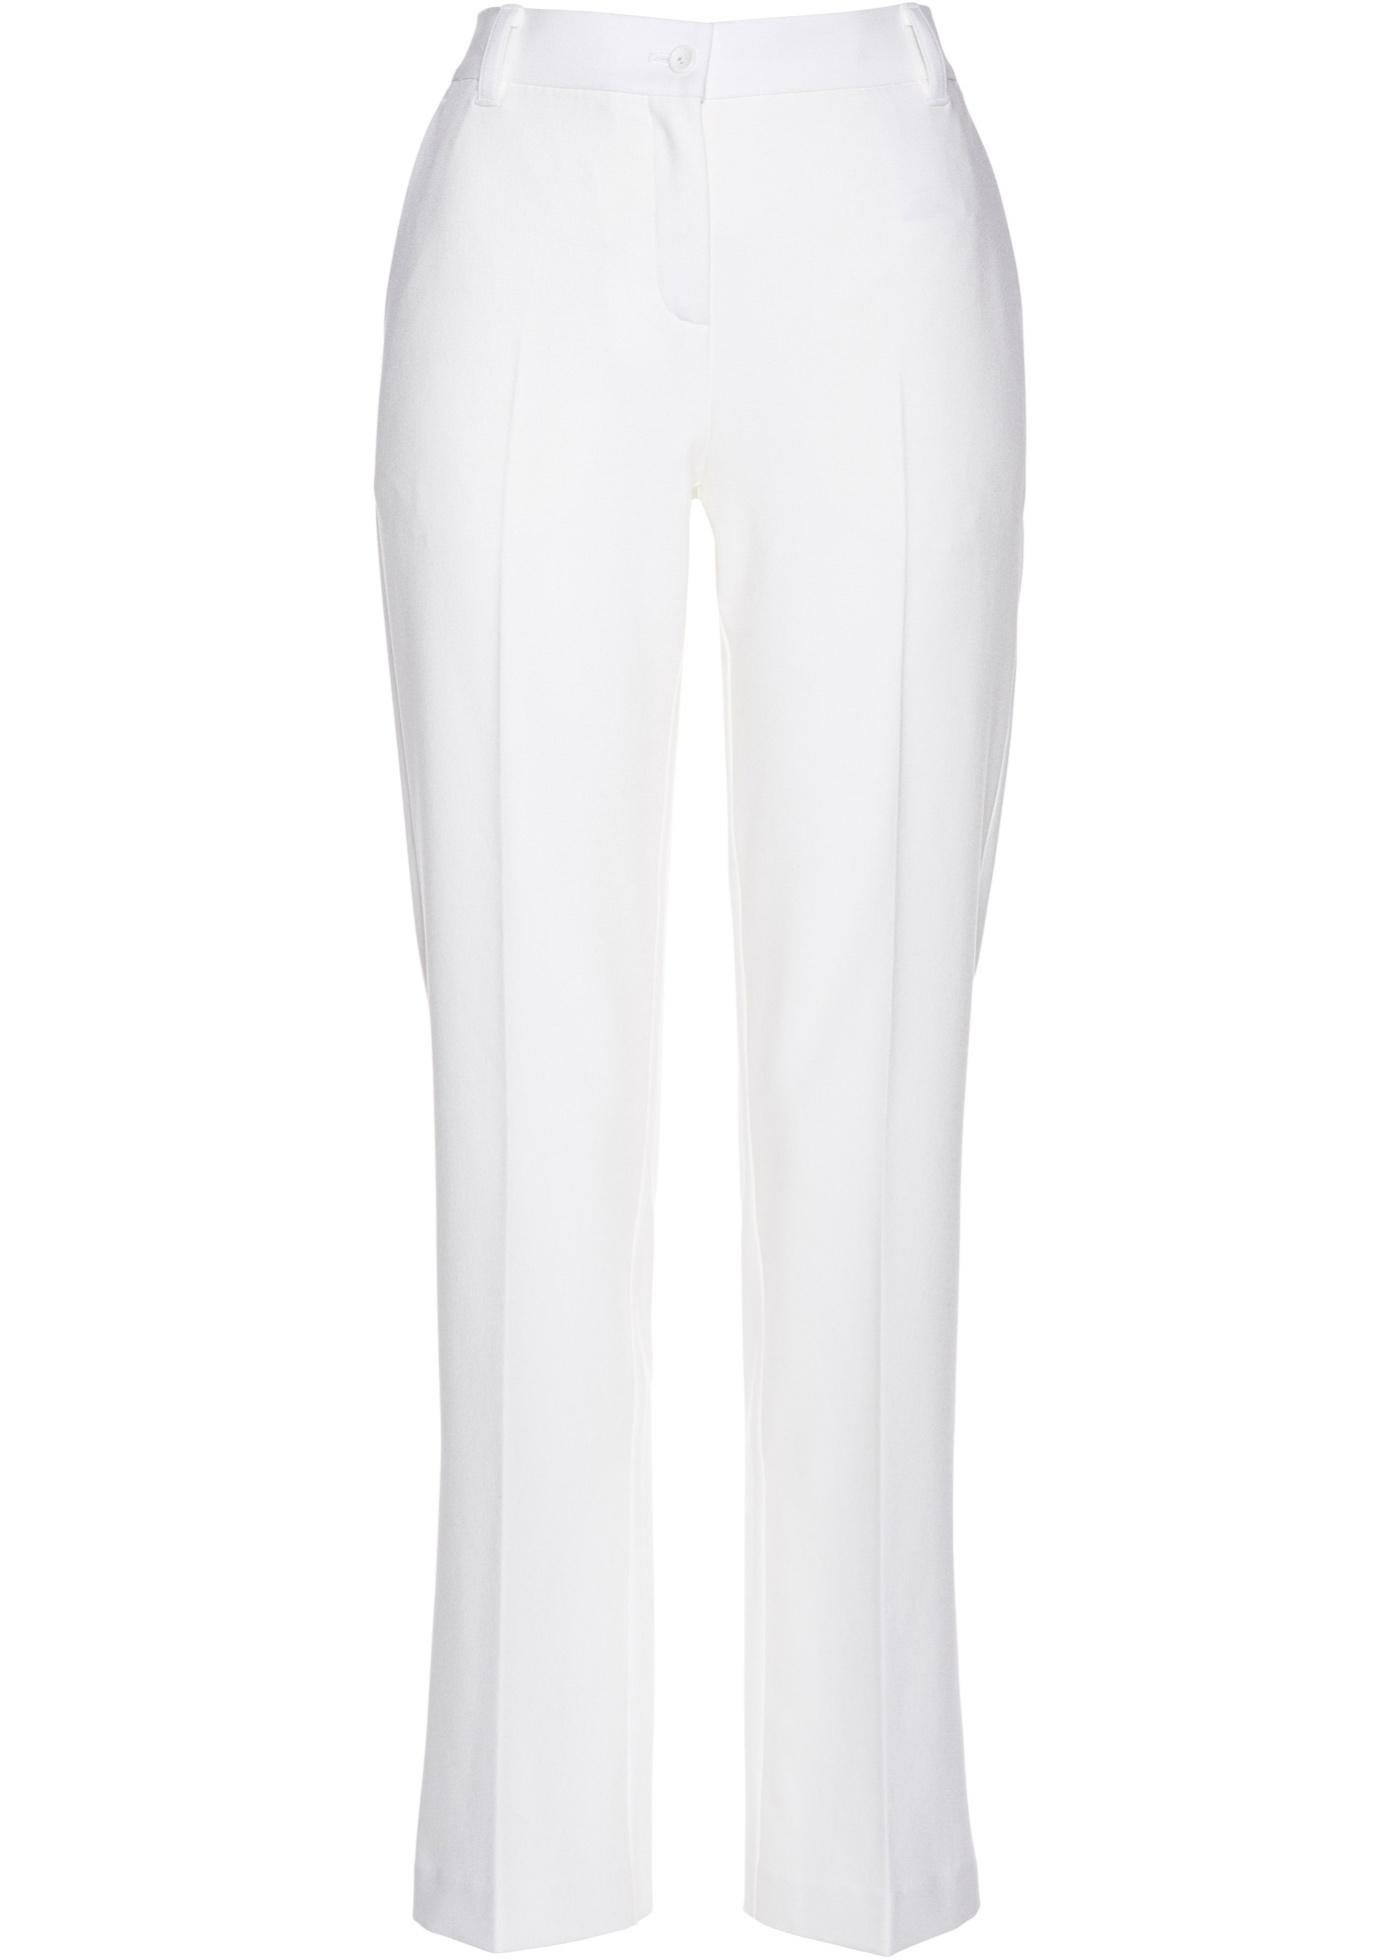 Femme Bpc Blanc Pour Selection Premium BonprixPantalon EYDW29eHIb